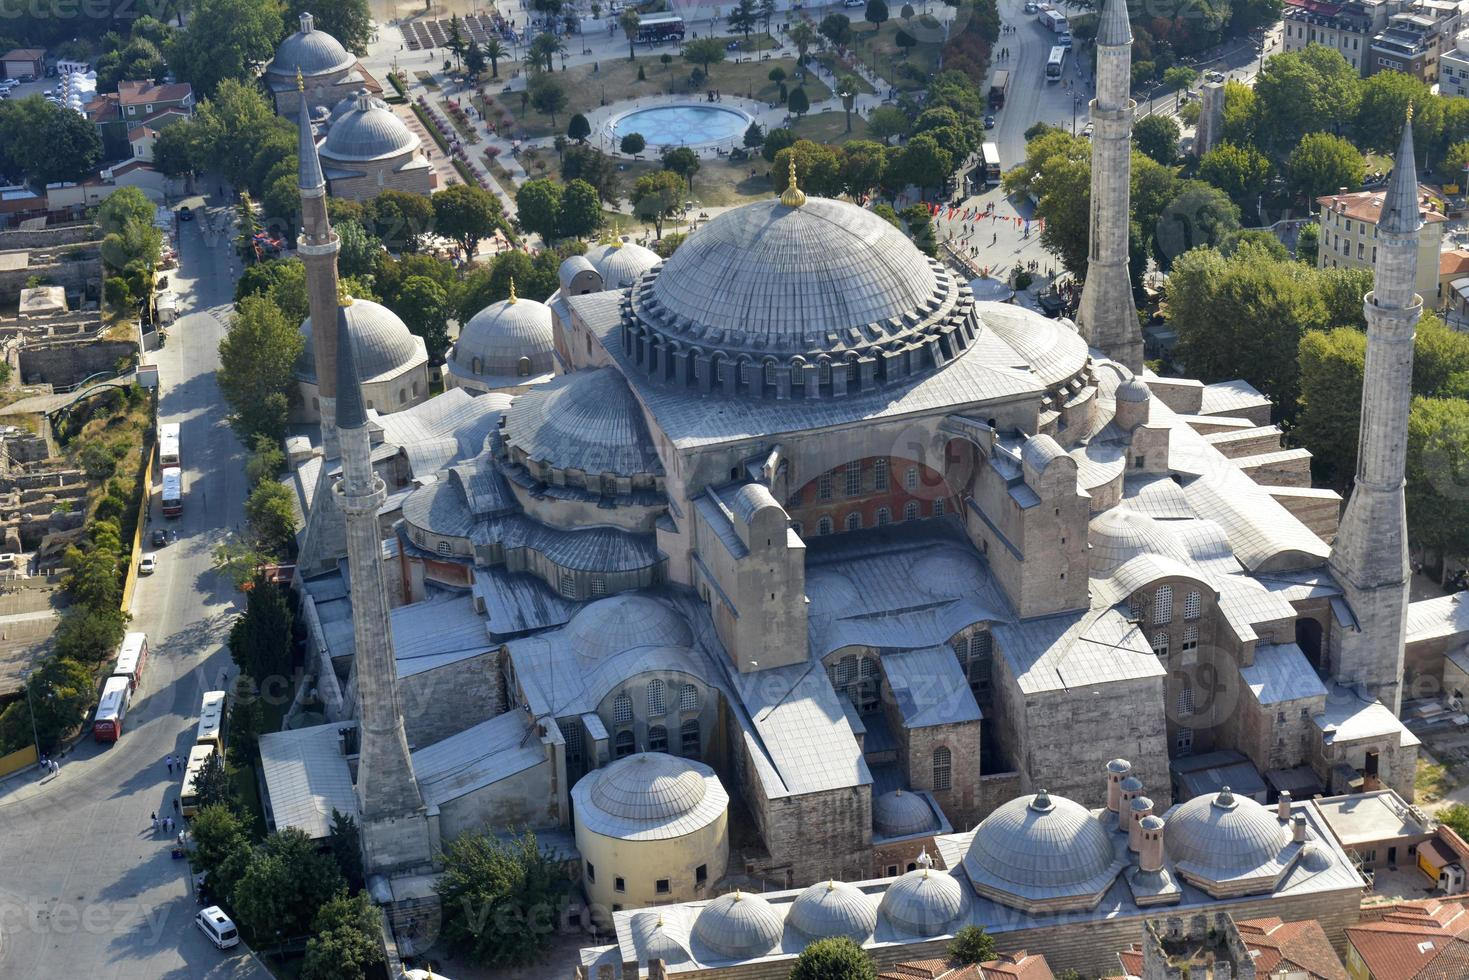 hagia sophia dans le quartier de sultanahmet, istanbul. dinde. photo